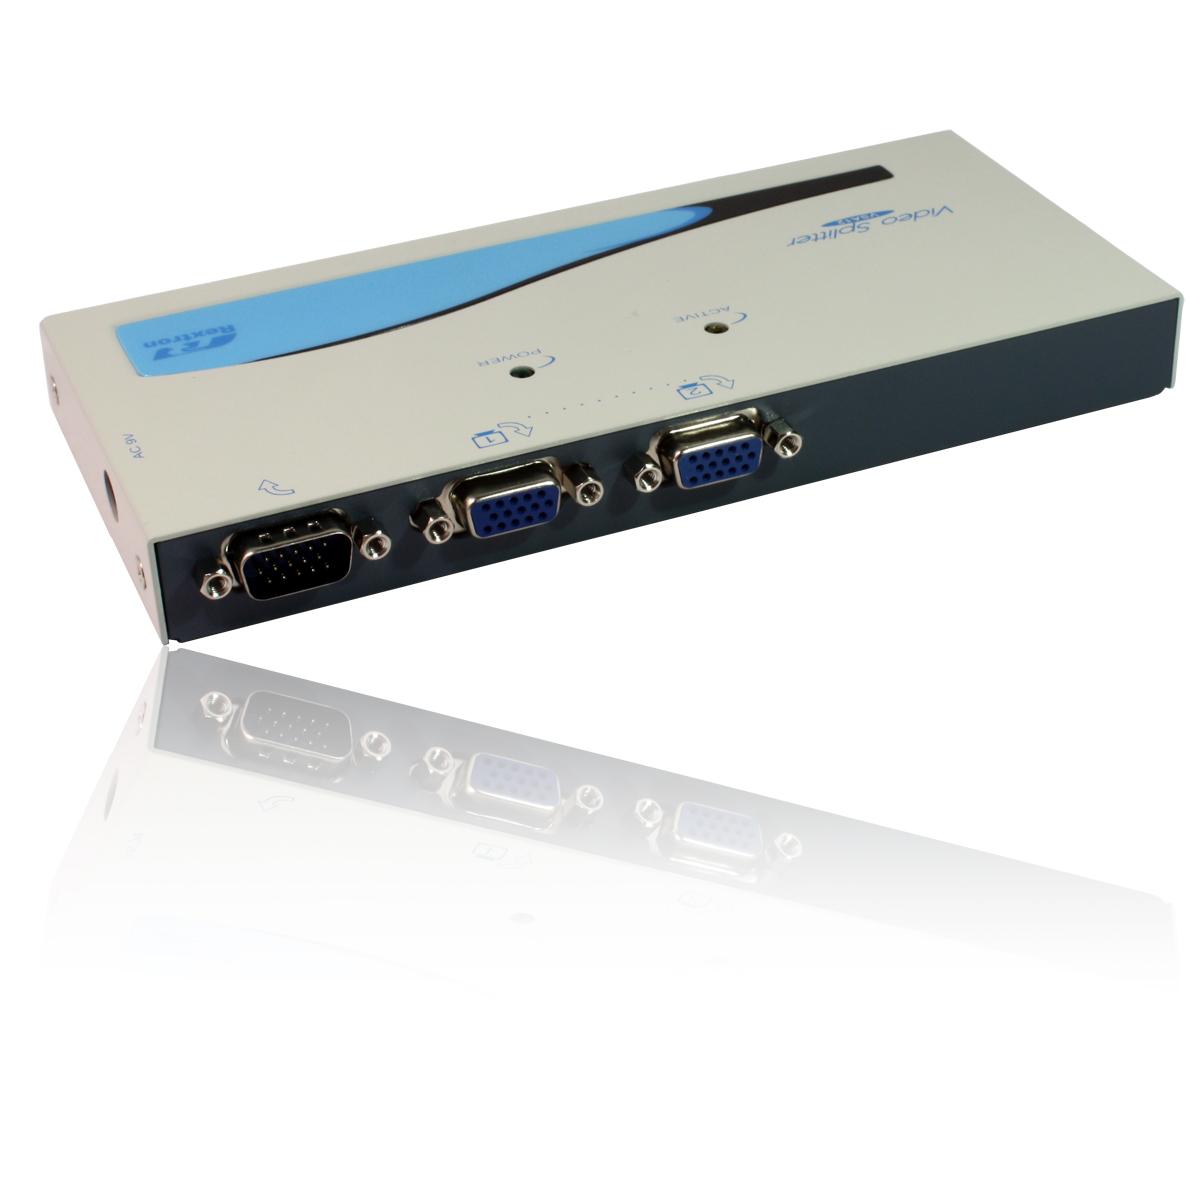 2 Port Way Video Signal Splitter Box Svga Vga Hd15 Hdtv Monitor Y Converter Spliter Thumbnail 3 4 5